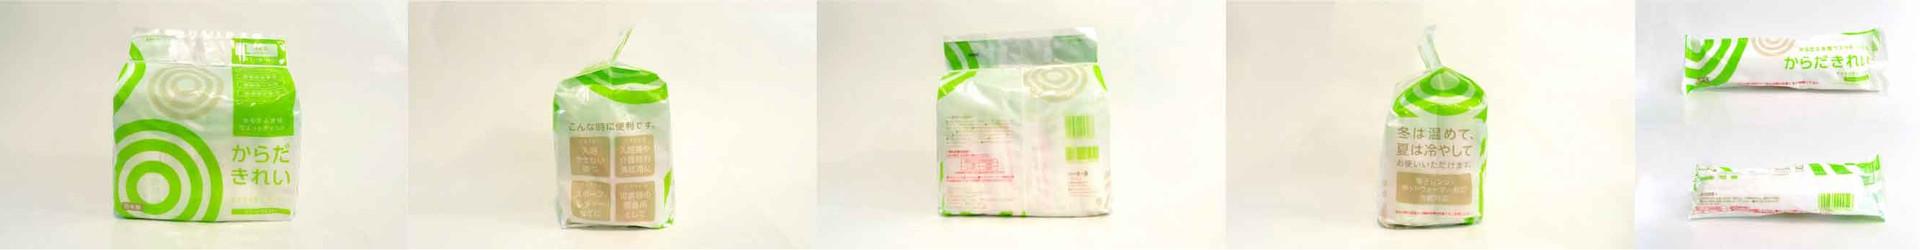 original japanese package design